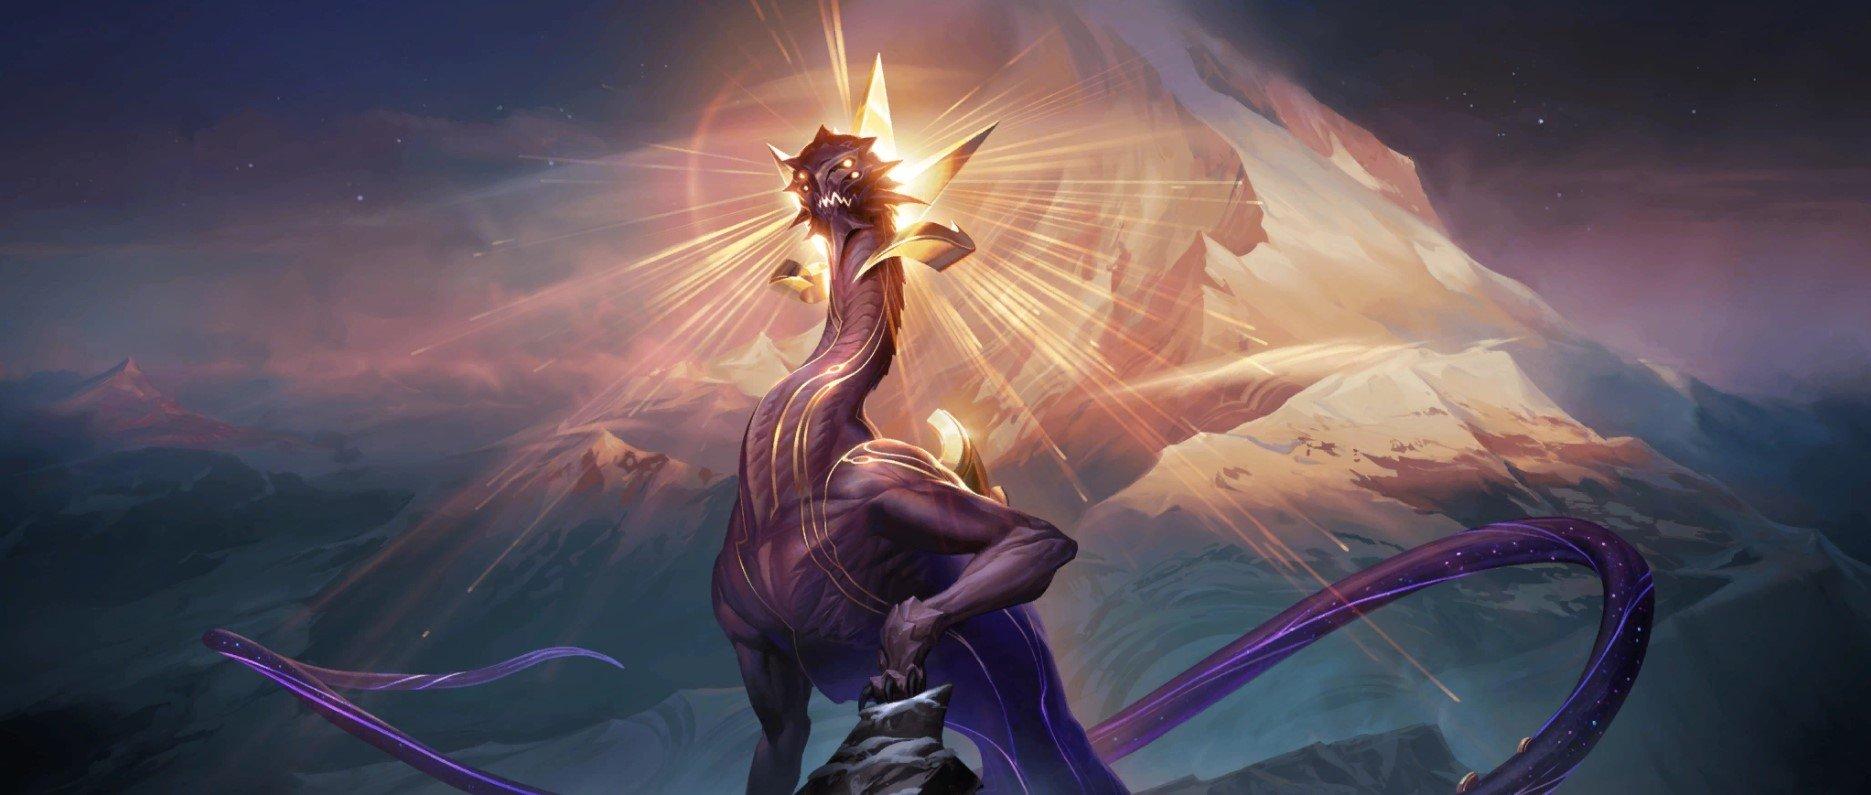 Top 5 Targon Cards in Legends of Runeterra (Monuments of Power)